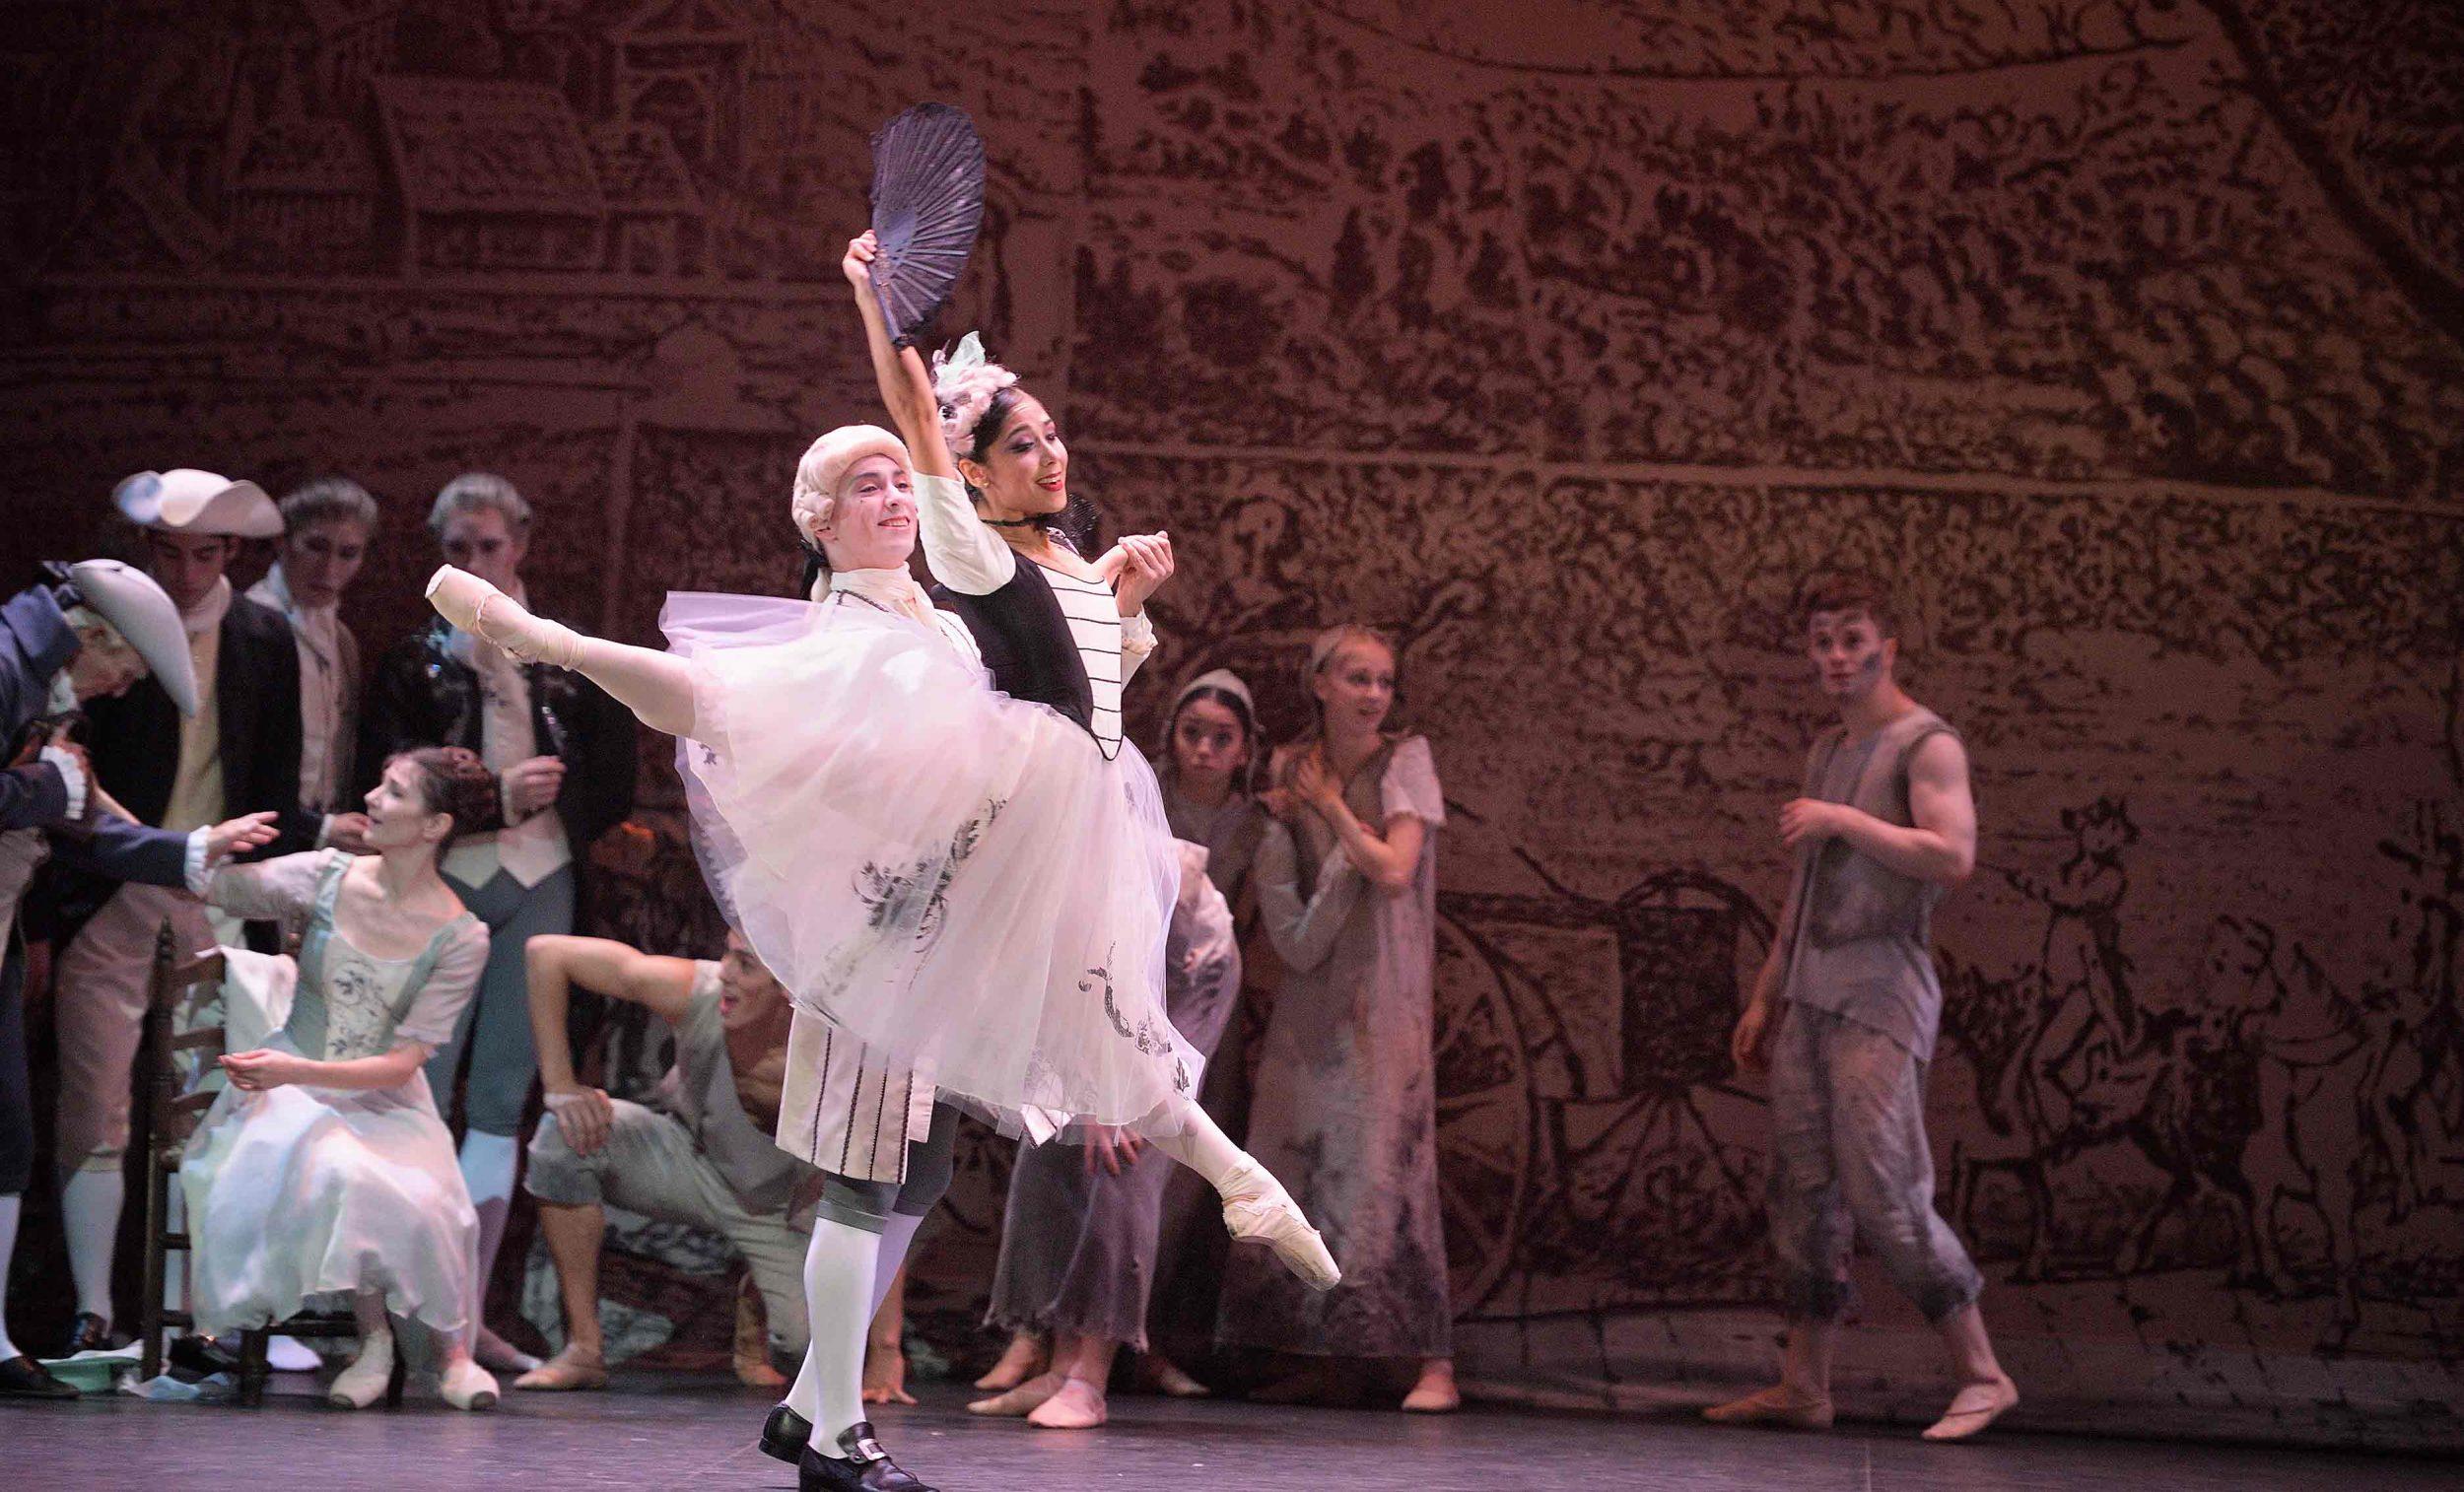 Daniel-Kraus-and-Crystal-Costa-in-Manon-(c)-Laurent-Liotardo_WEB